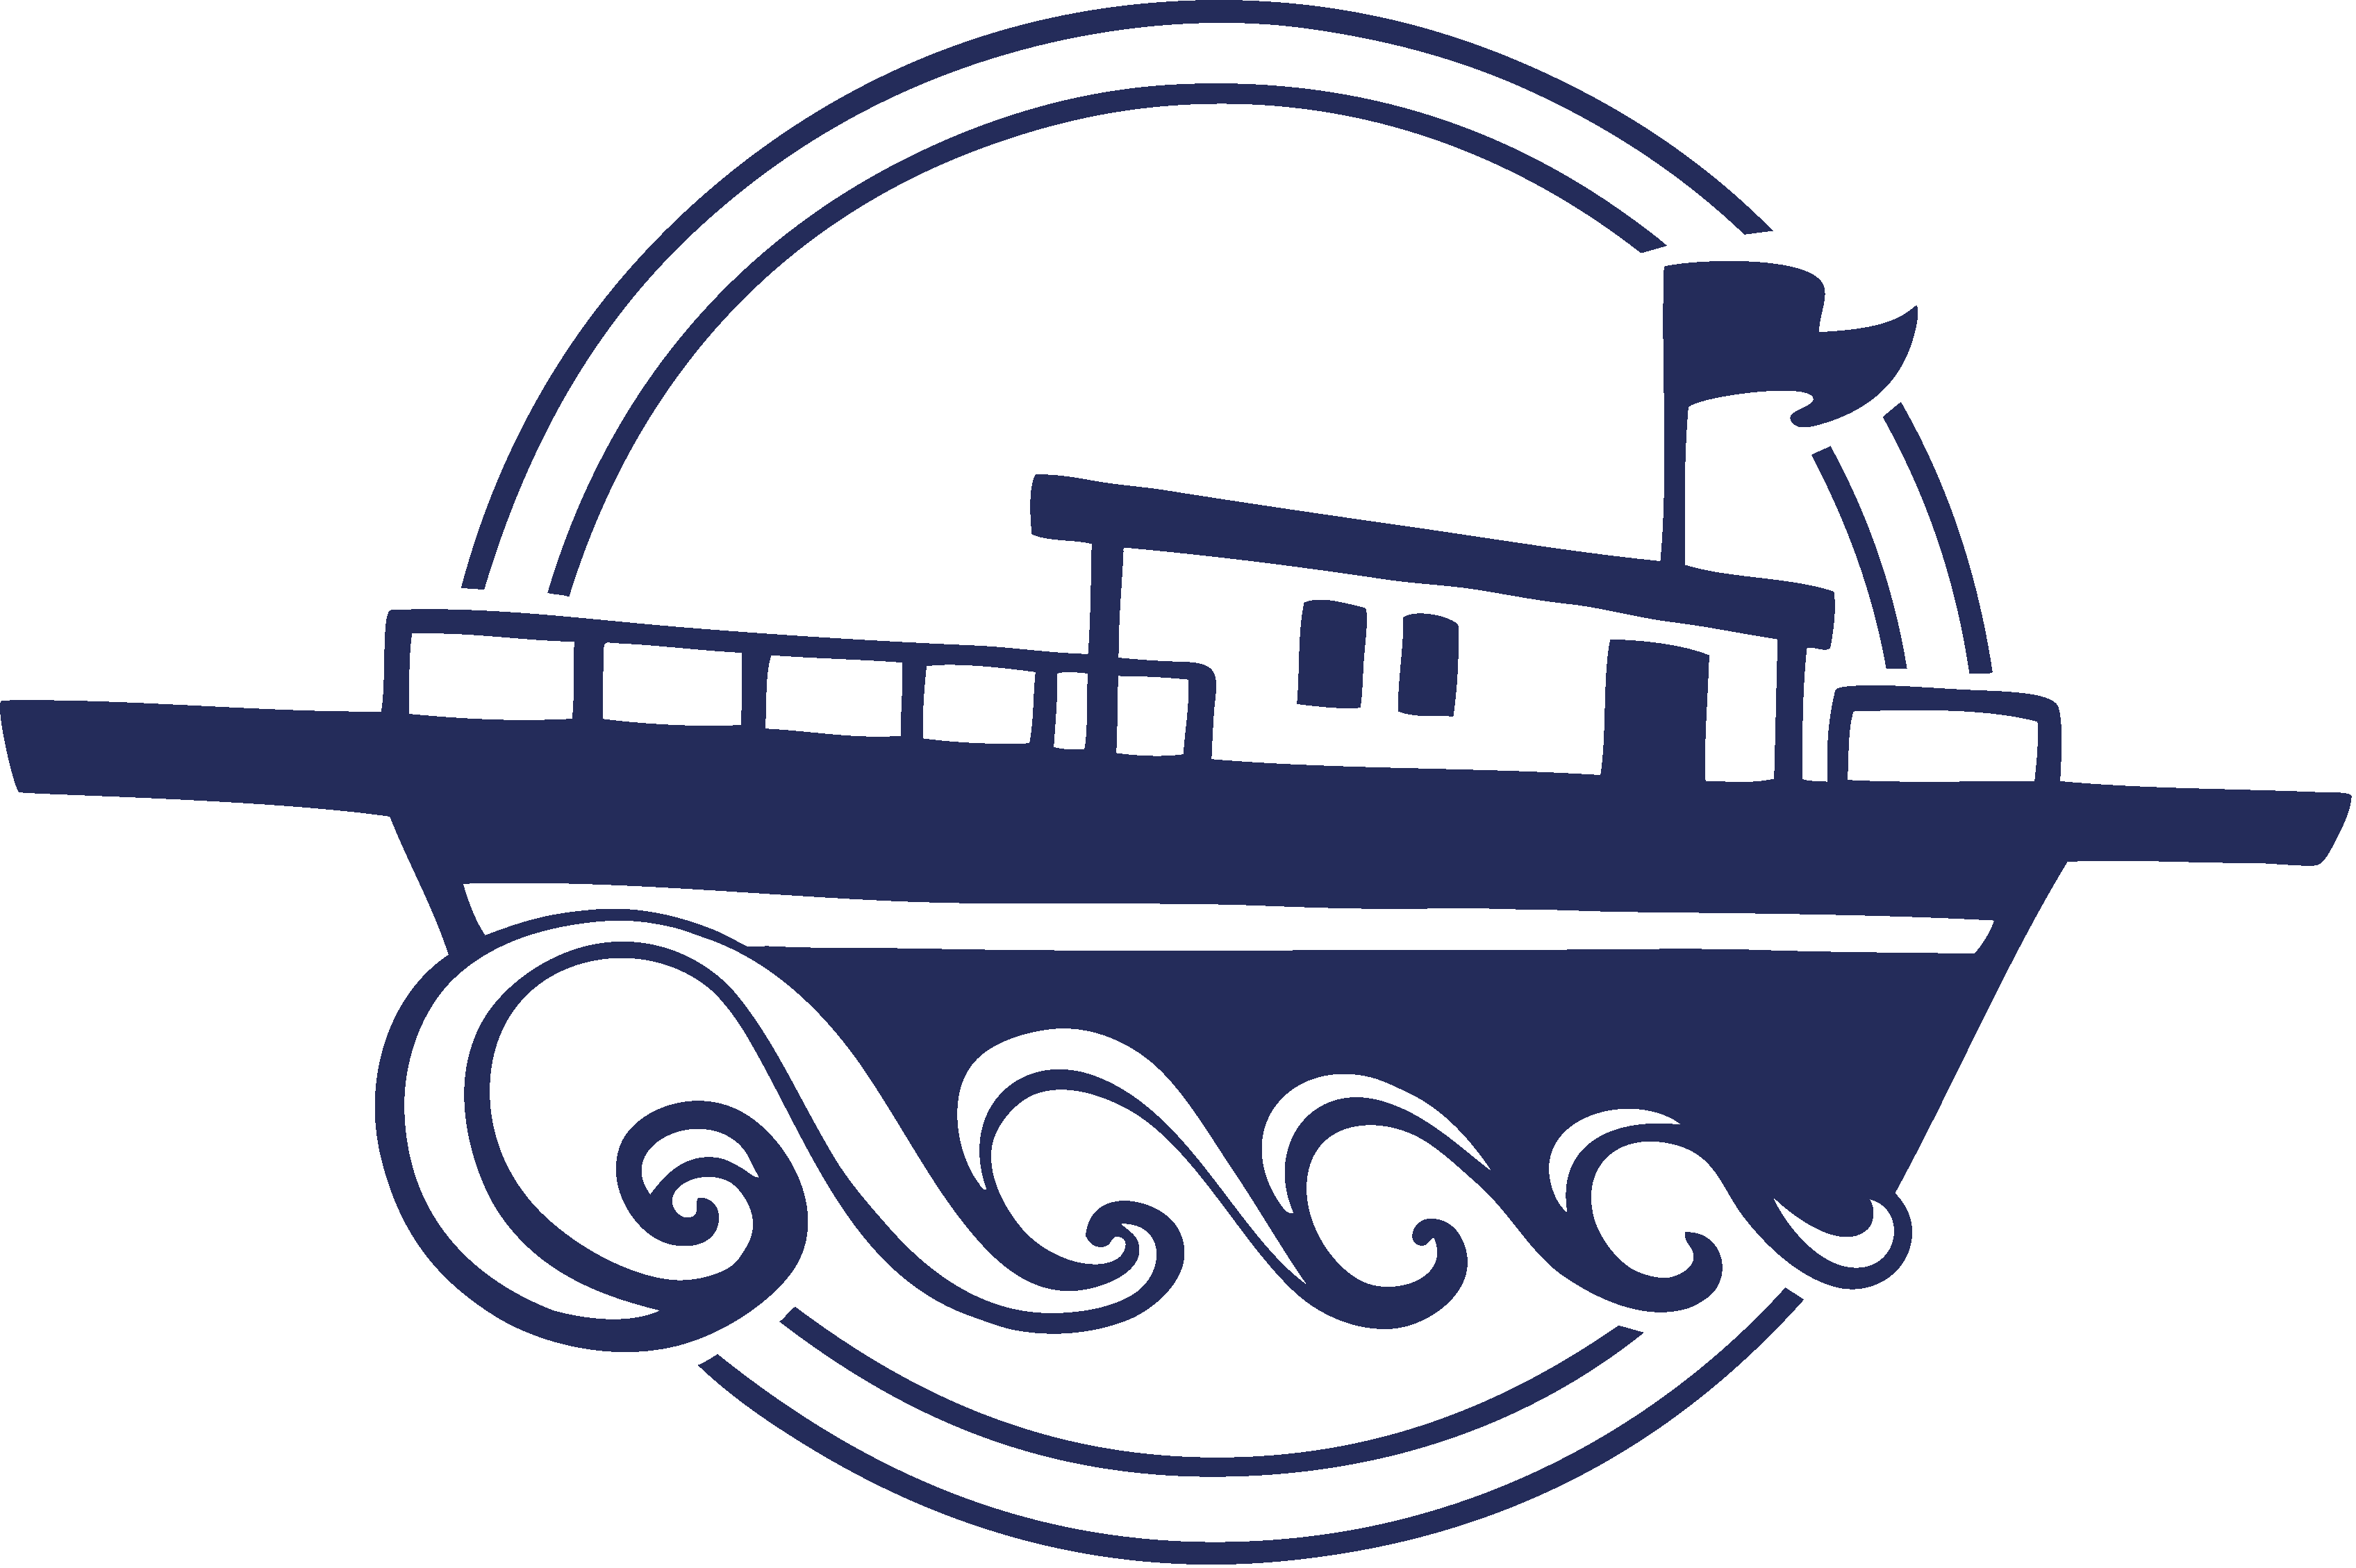 Fähren Wettin-Löbejün